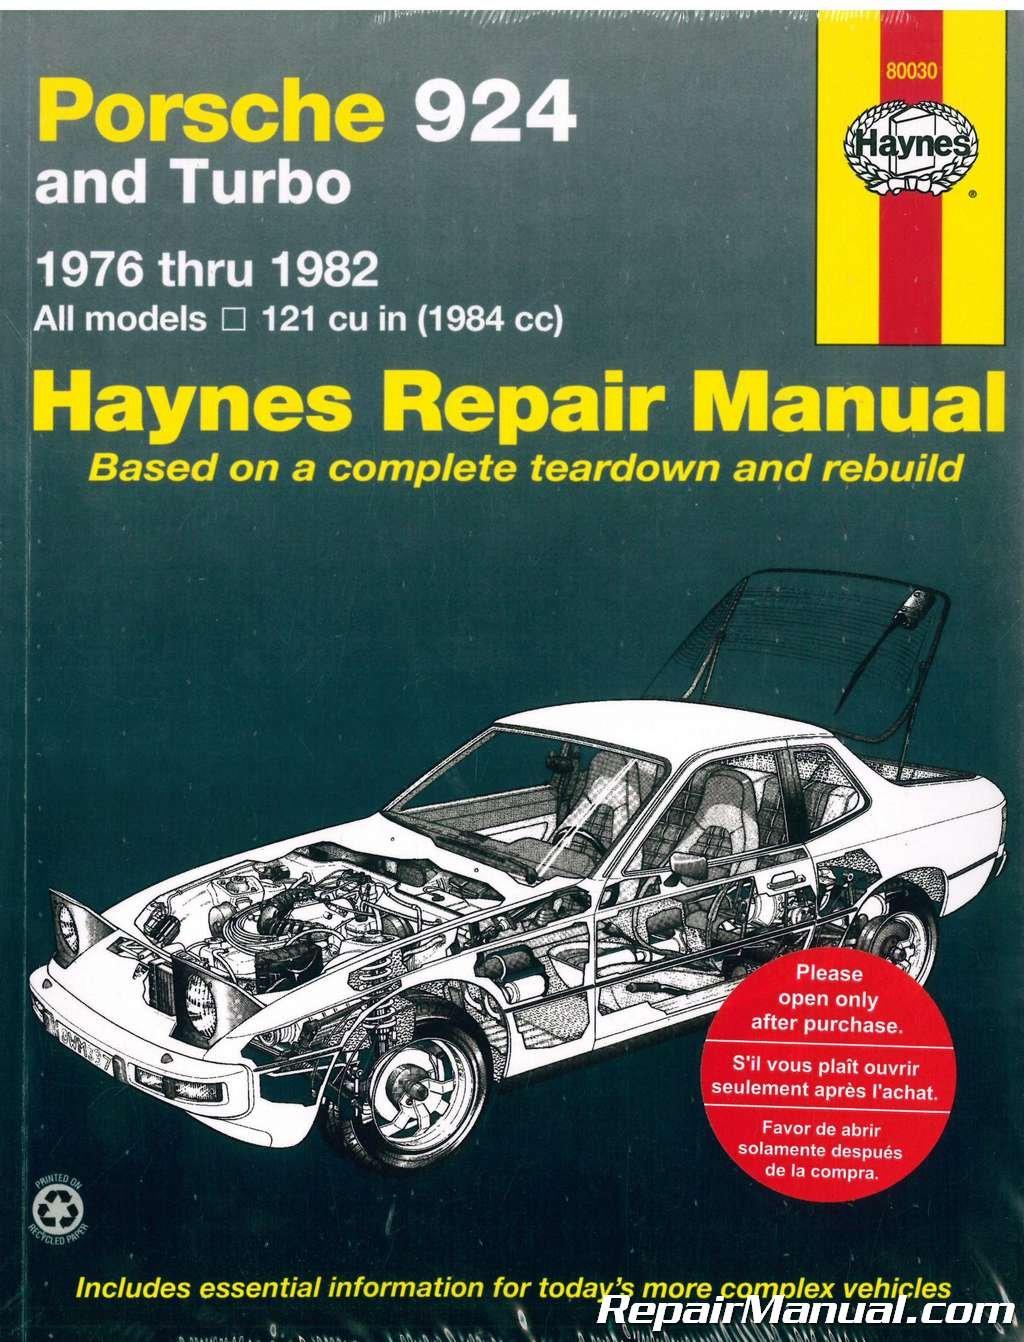 Read Online H80030 Haynes Porsche 924 1976-1982 Auto Repair Manual pdf